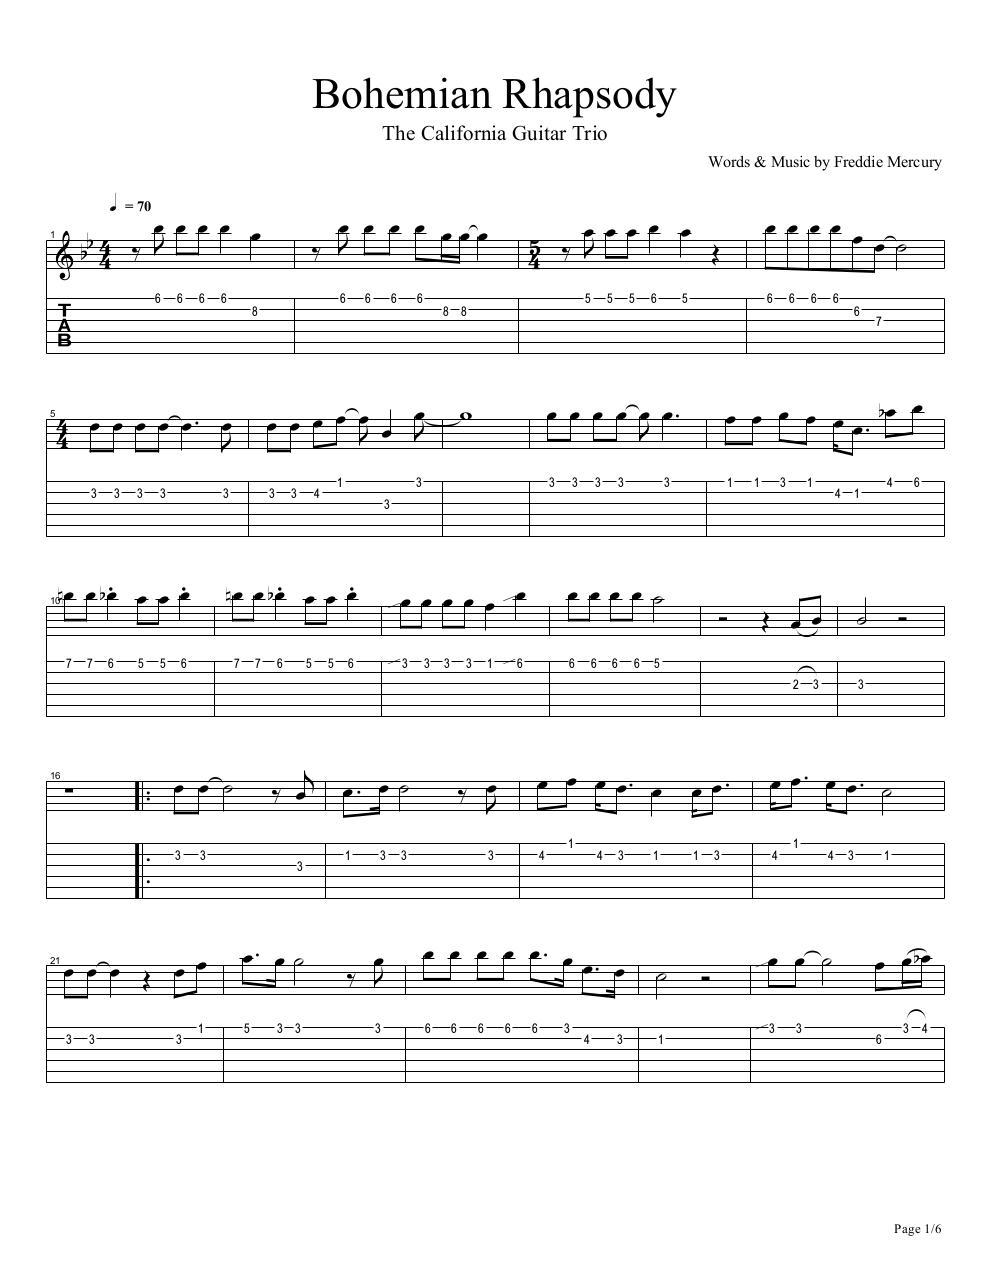 Top 12 Bohemian Rhapsody Piano Sheet Music Pdf Jarrod